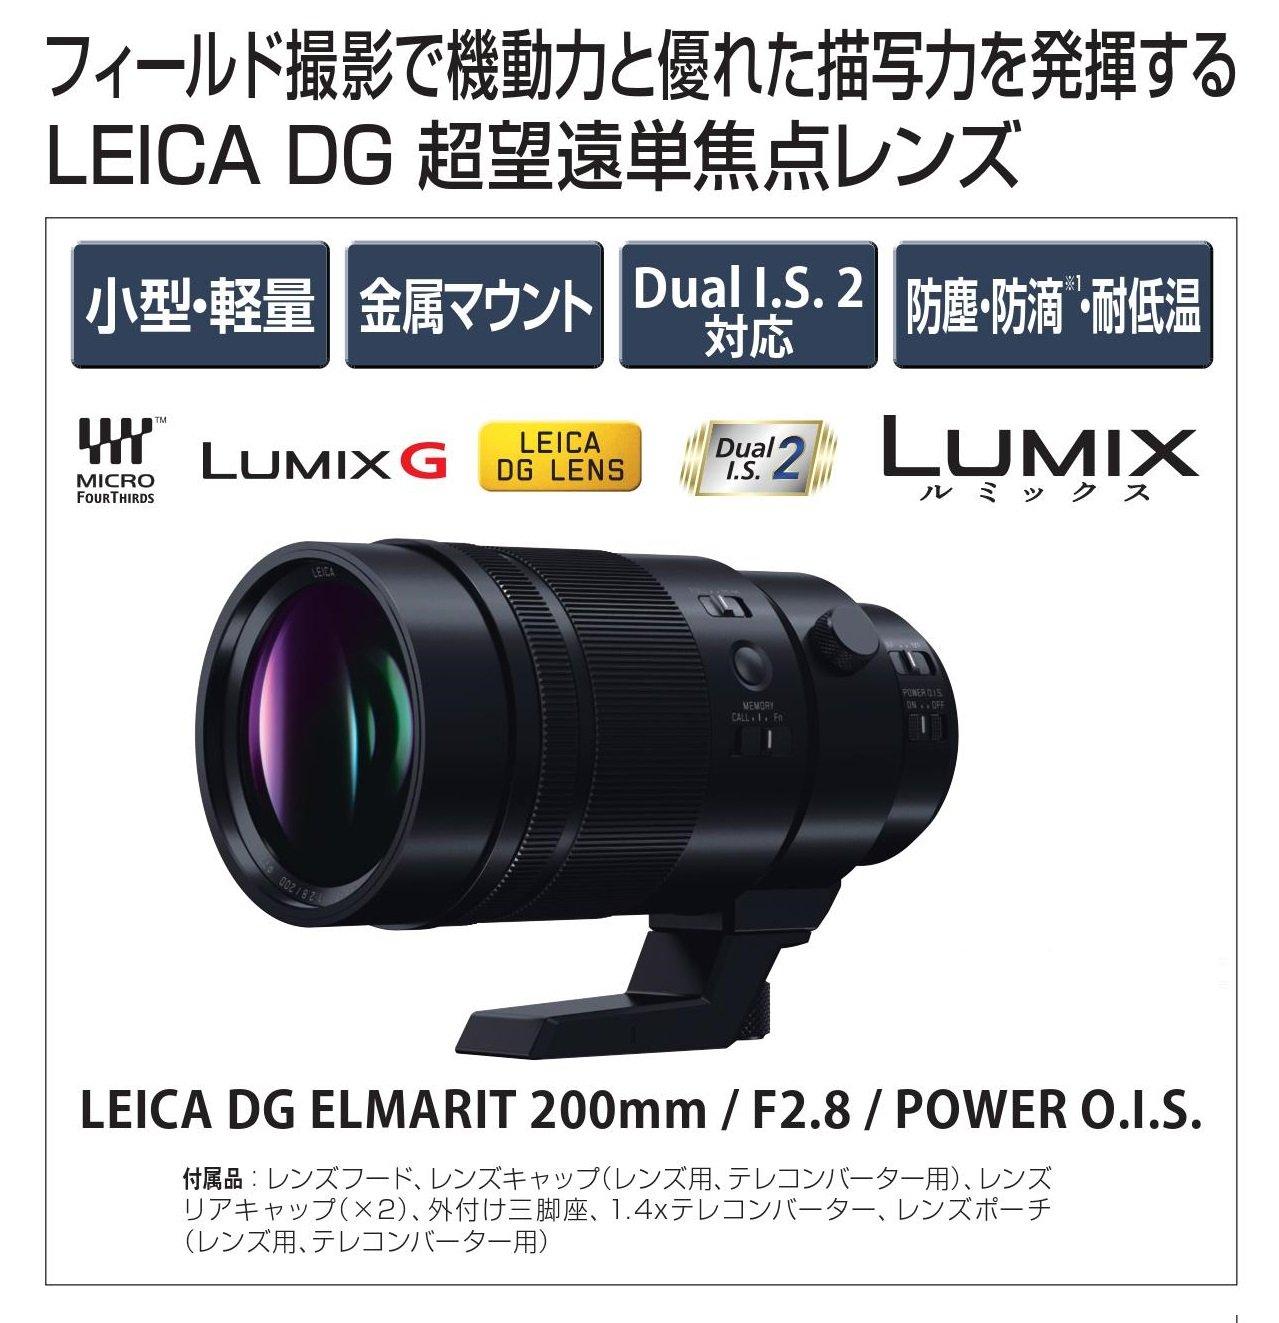 Leica Dg Elmarit 200mm F28 Power Ois Micro Panasonic F 28 Lens Four Thirds Mountjapan Domestic Genuine Products Camera Photo